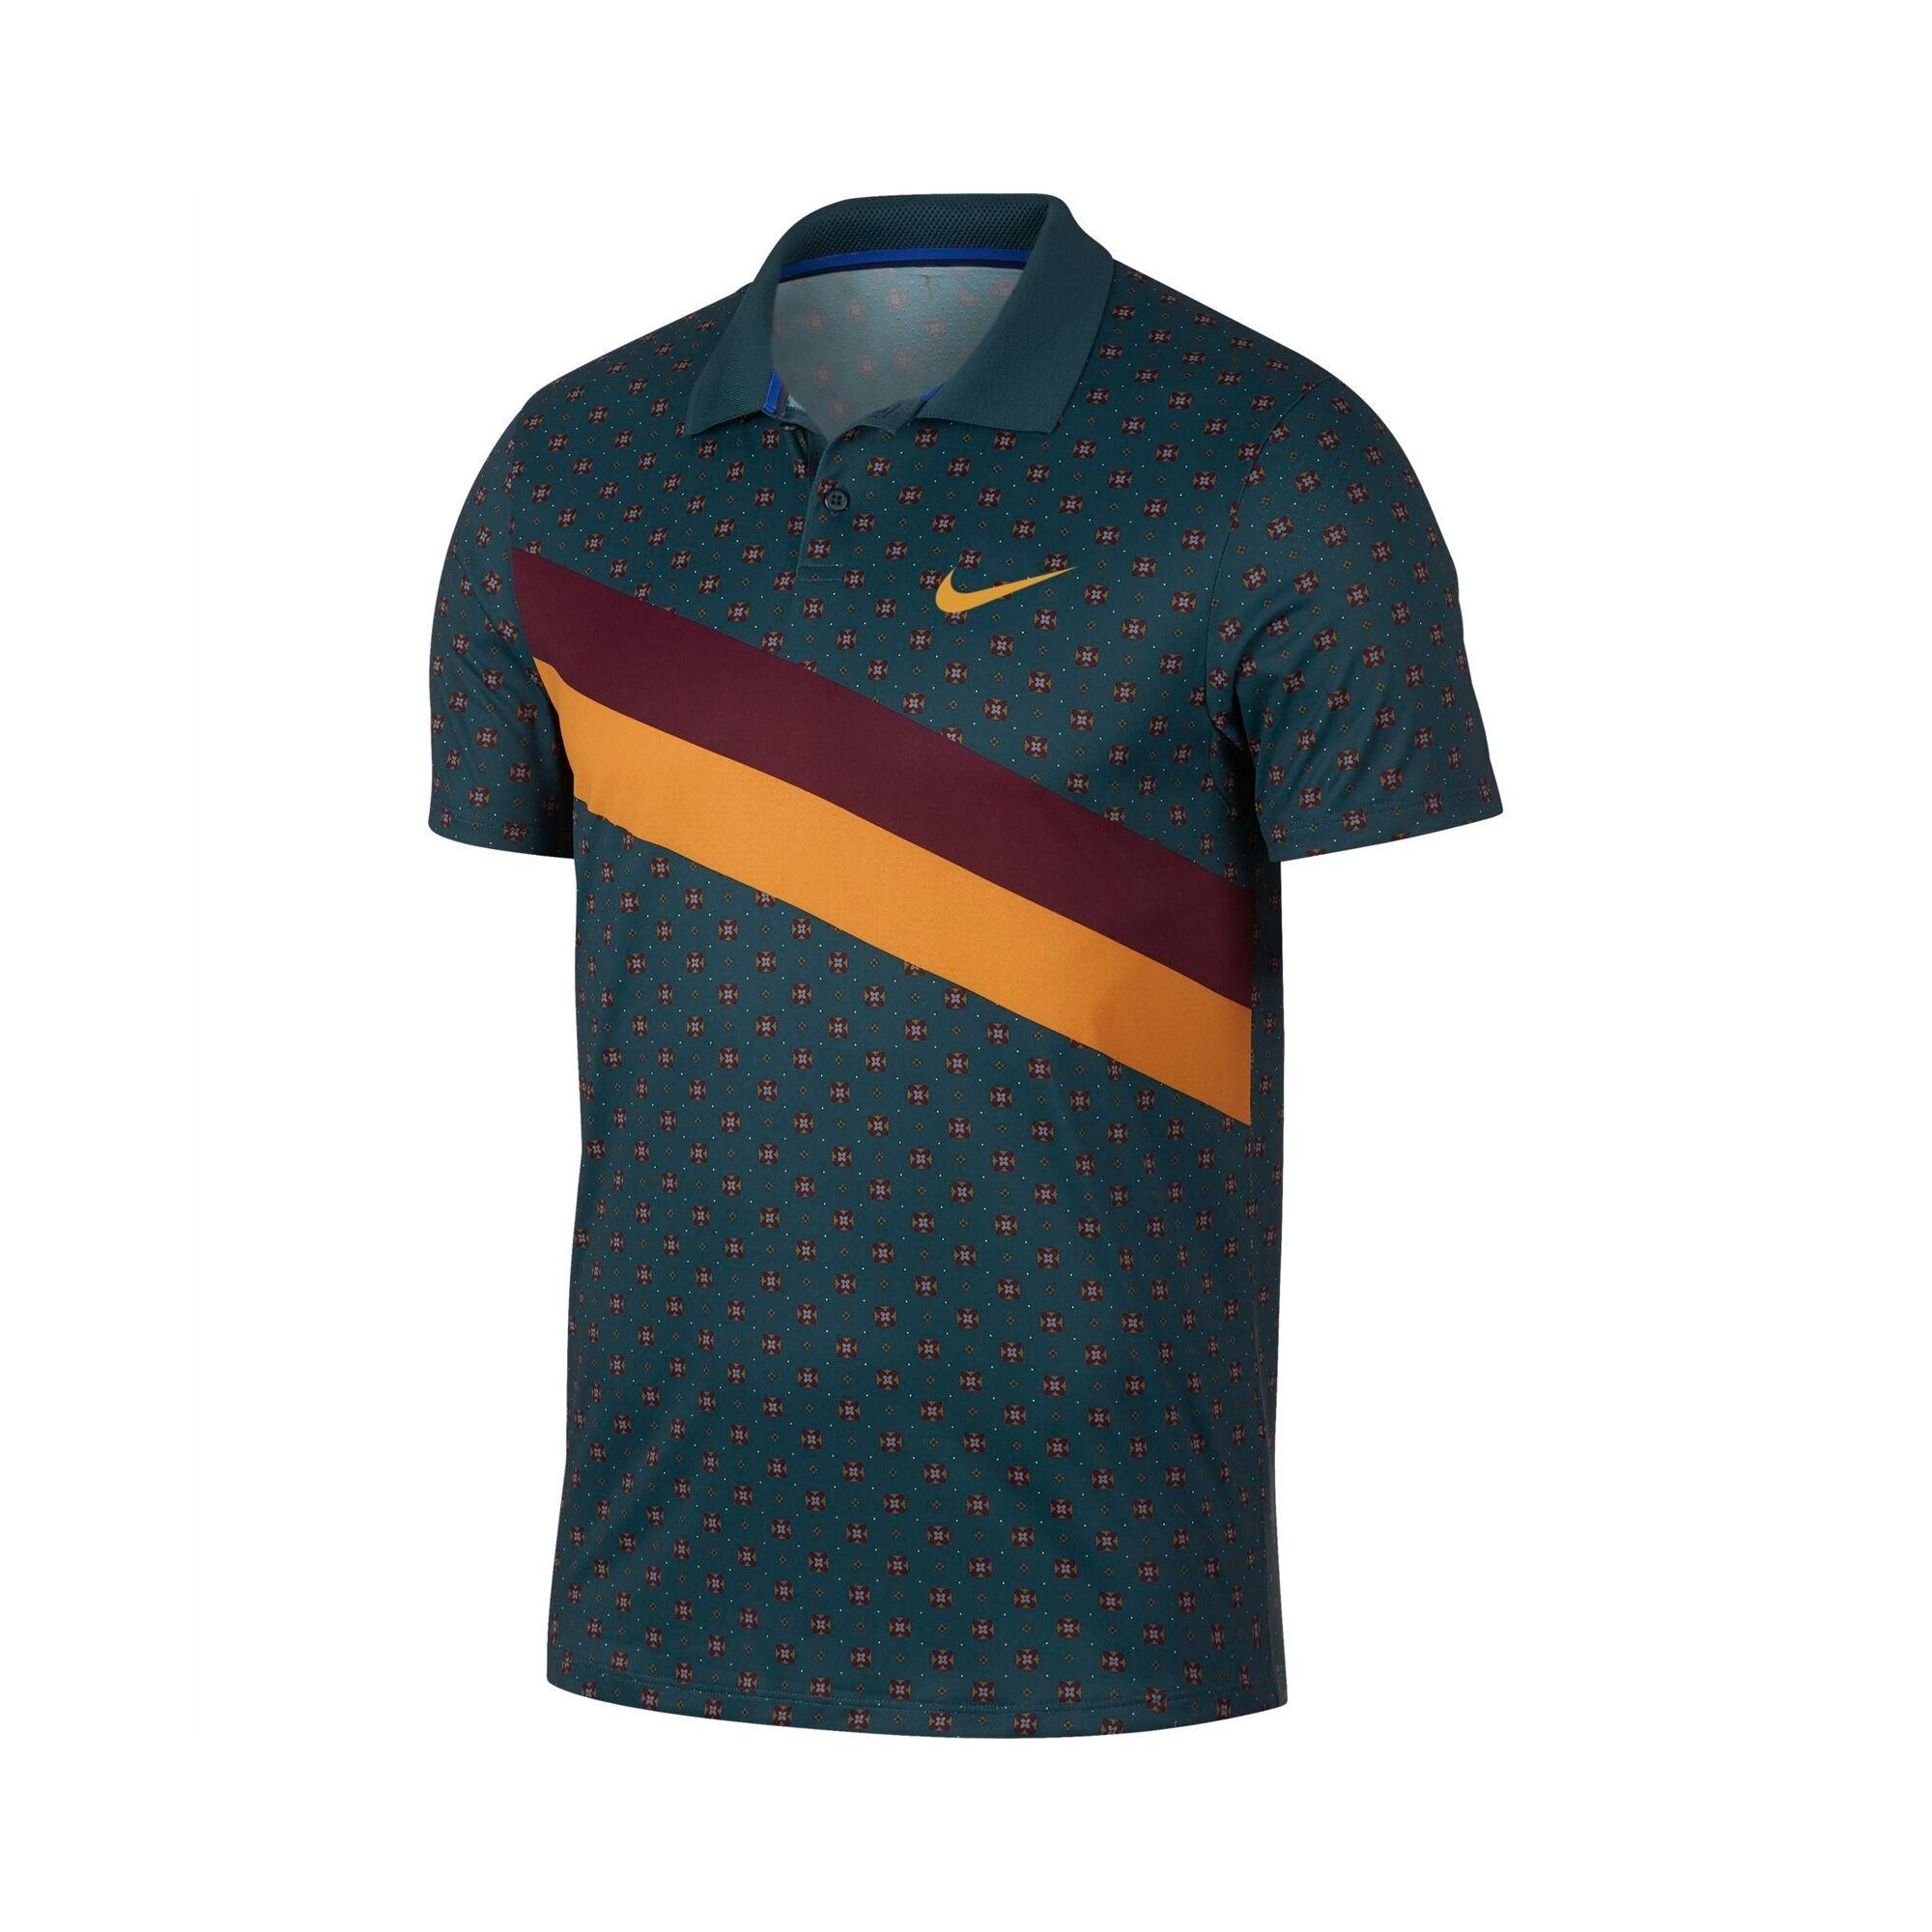 Nike Dri-Fit Polo Nightshade/Canyon Gold XL